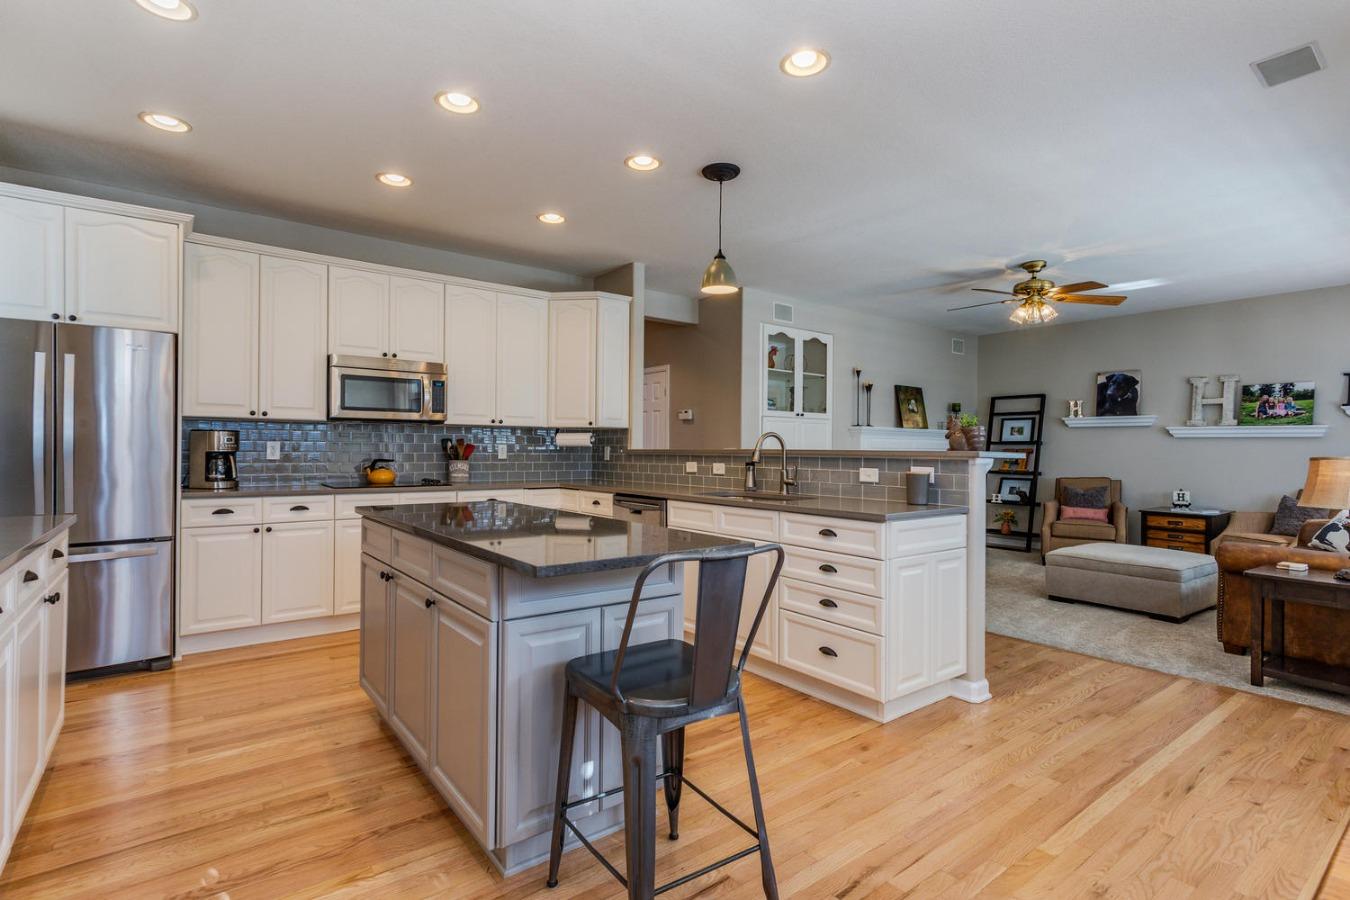 Quartz Counters & Newer Stainless Appliances